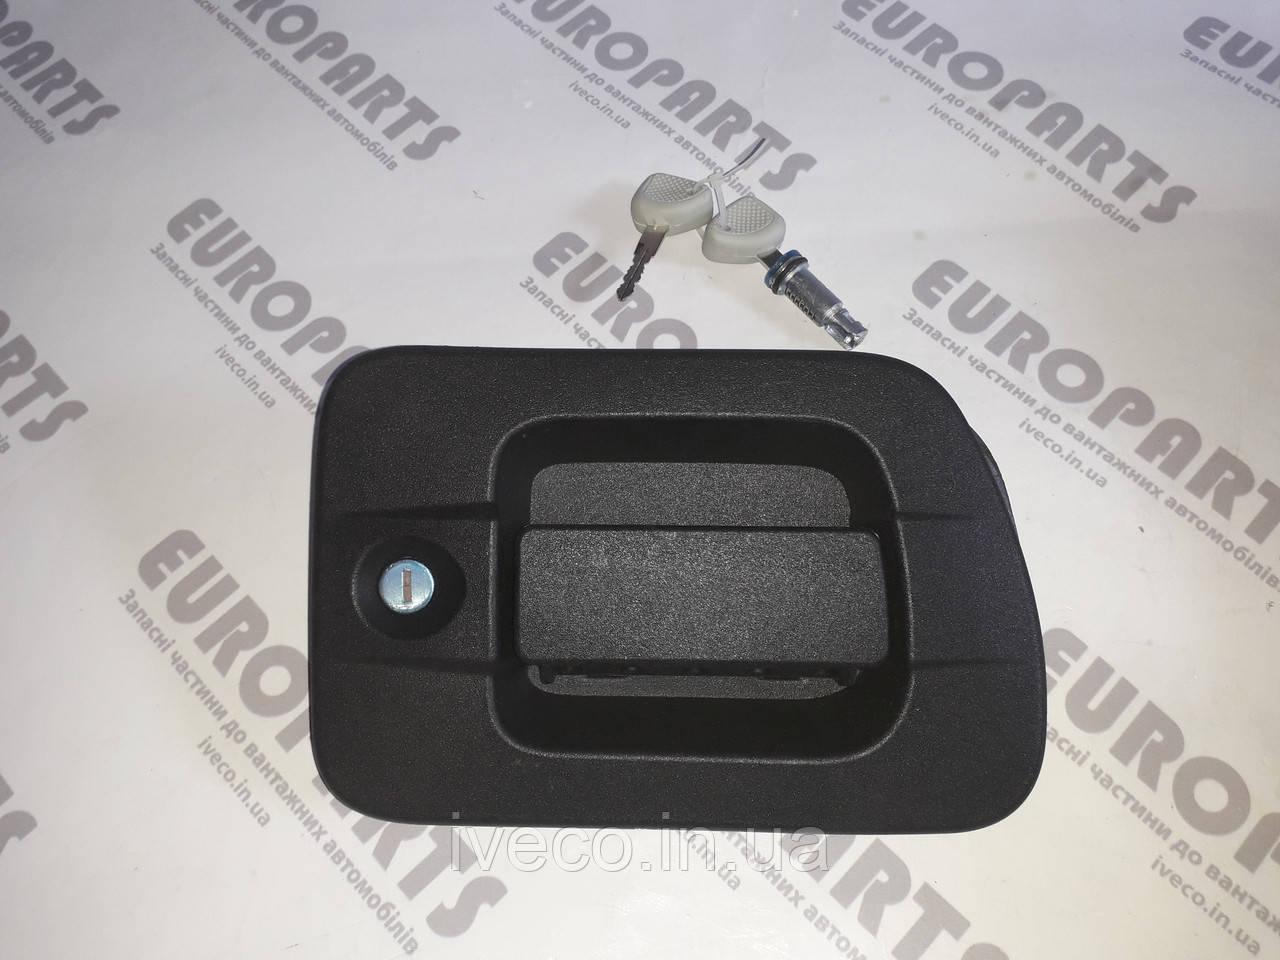 Ручка двери правая левая Iveco Stralis Iveco Trakker Iveco Eurocargo  50405293 504052936 504343231 504254457